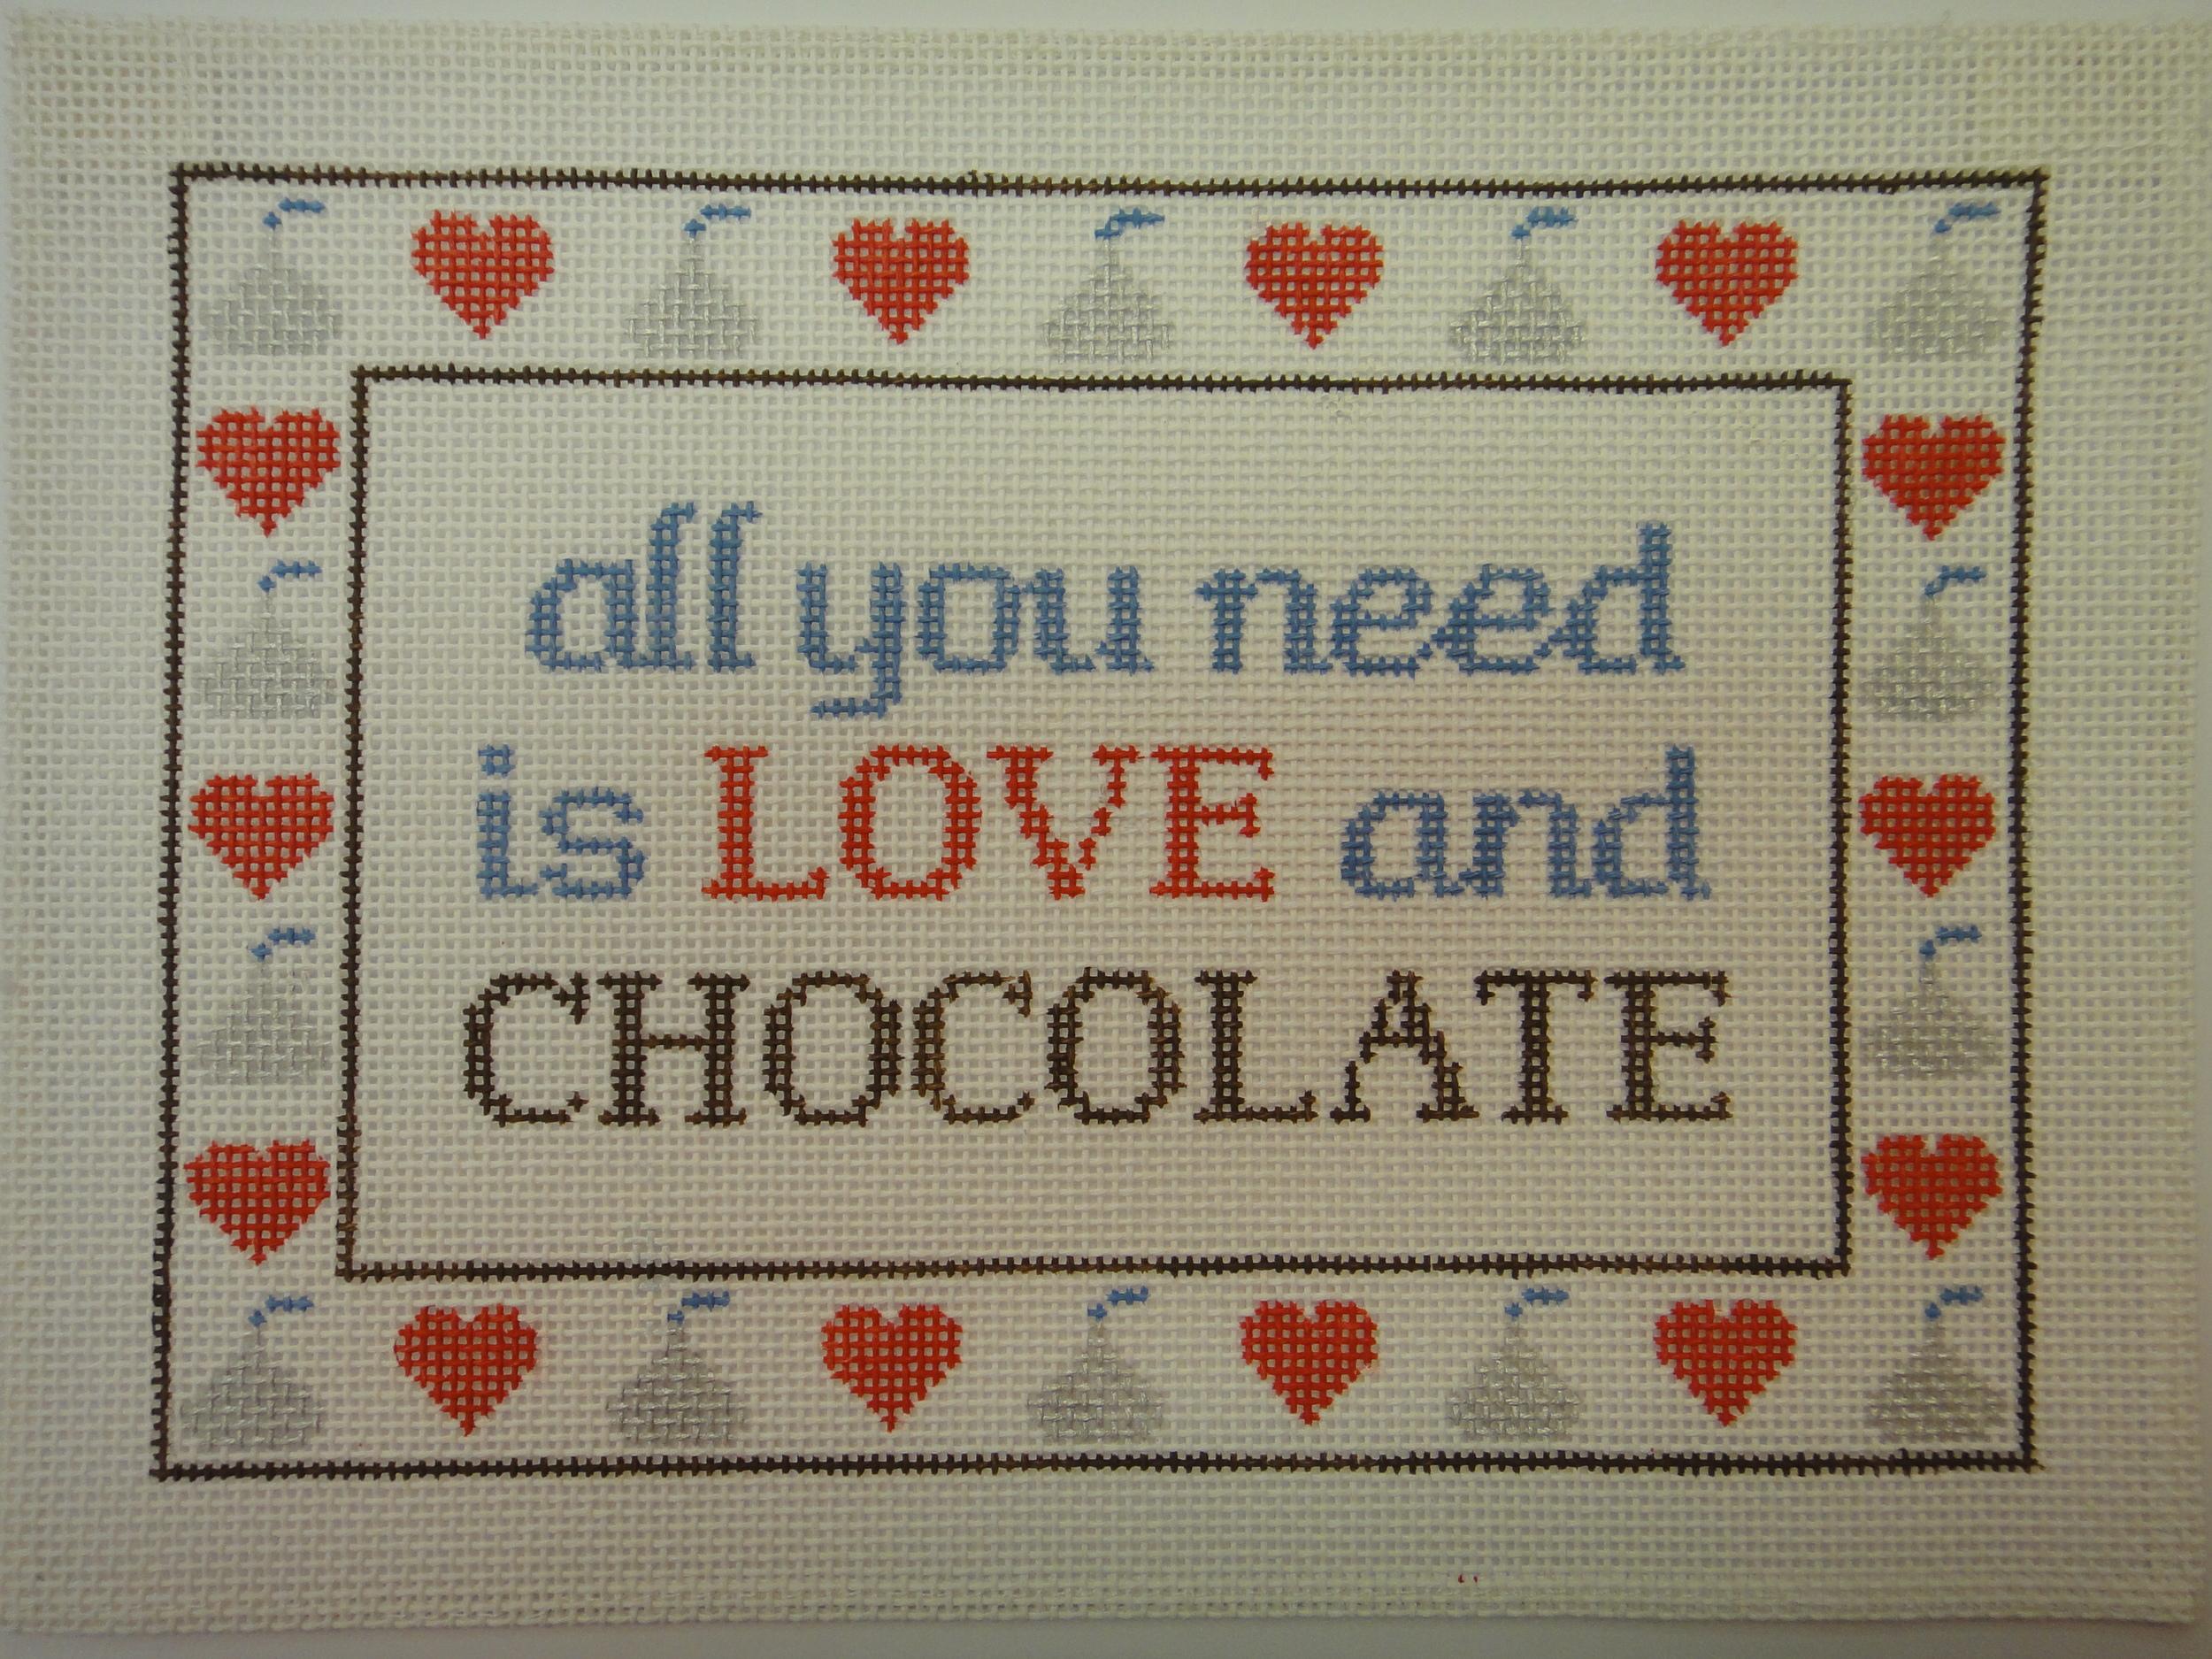 S67 Love and Chocolate (10x7)